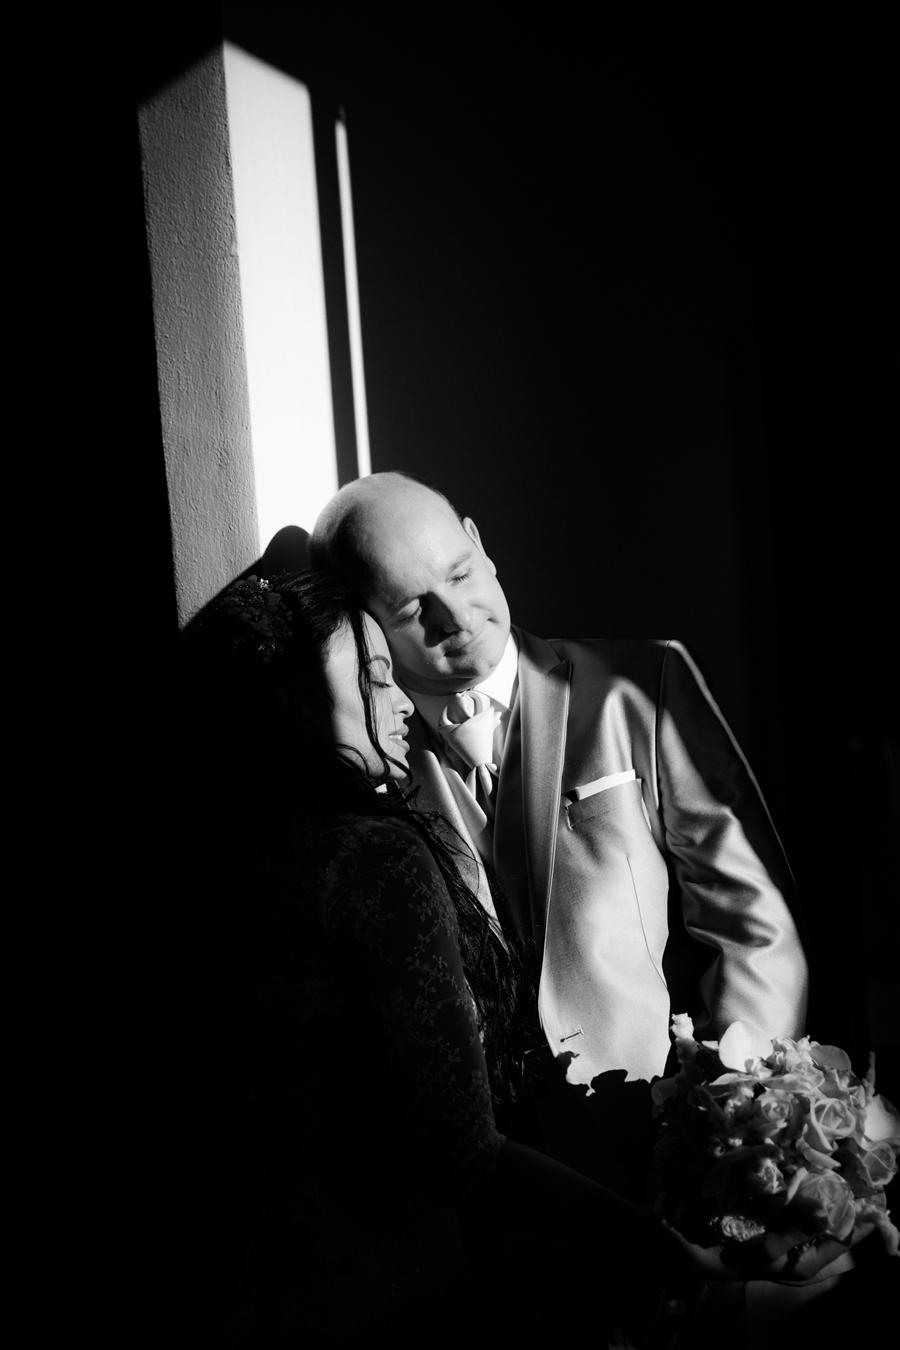 Weddingdestination-Storytelling-Renato-Zanette-Fotografo-Fregona-Treviso-Veneto-Per-Sempre